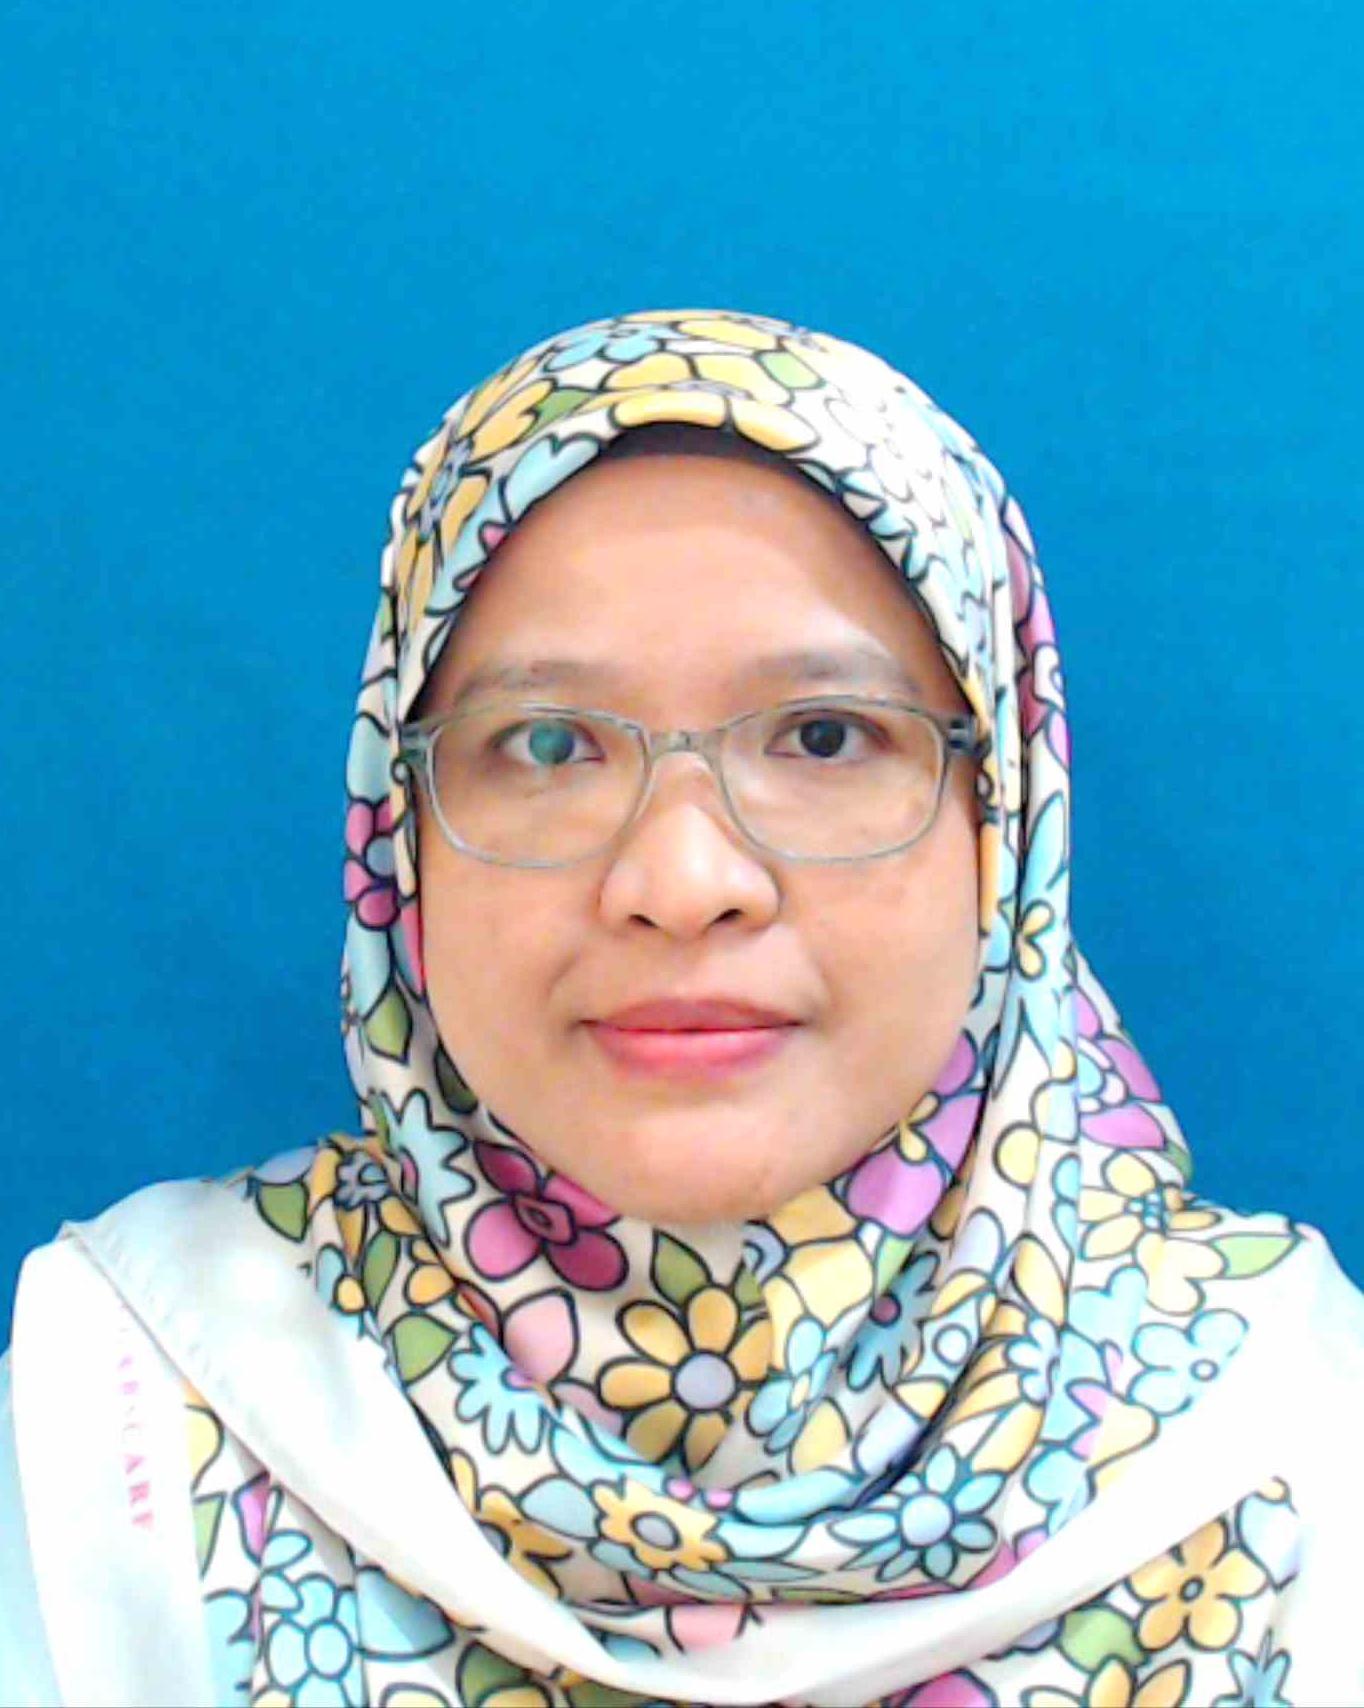 Siti Roshaidai Binti Mohd Arifin